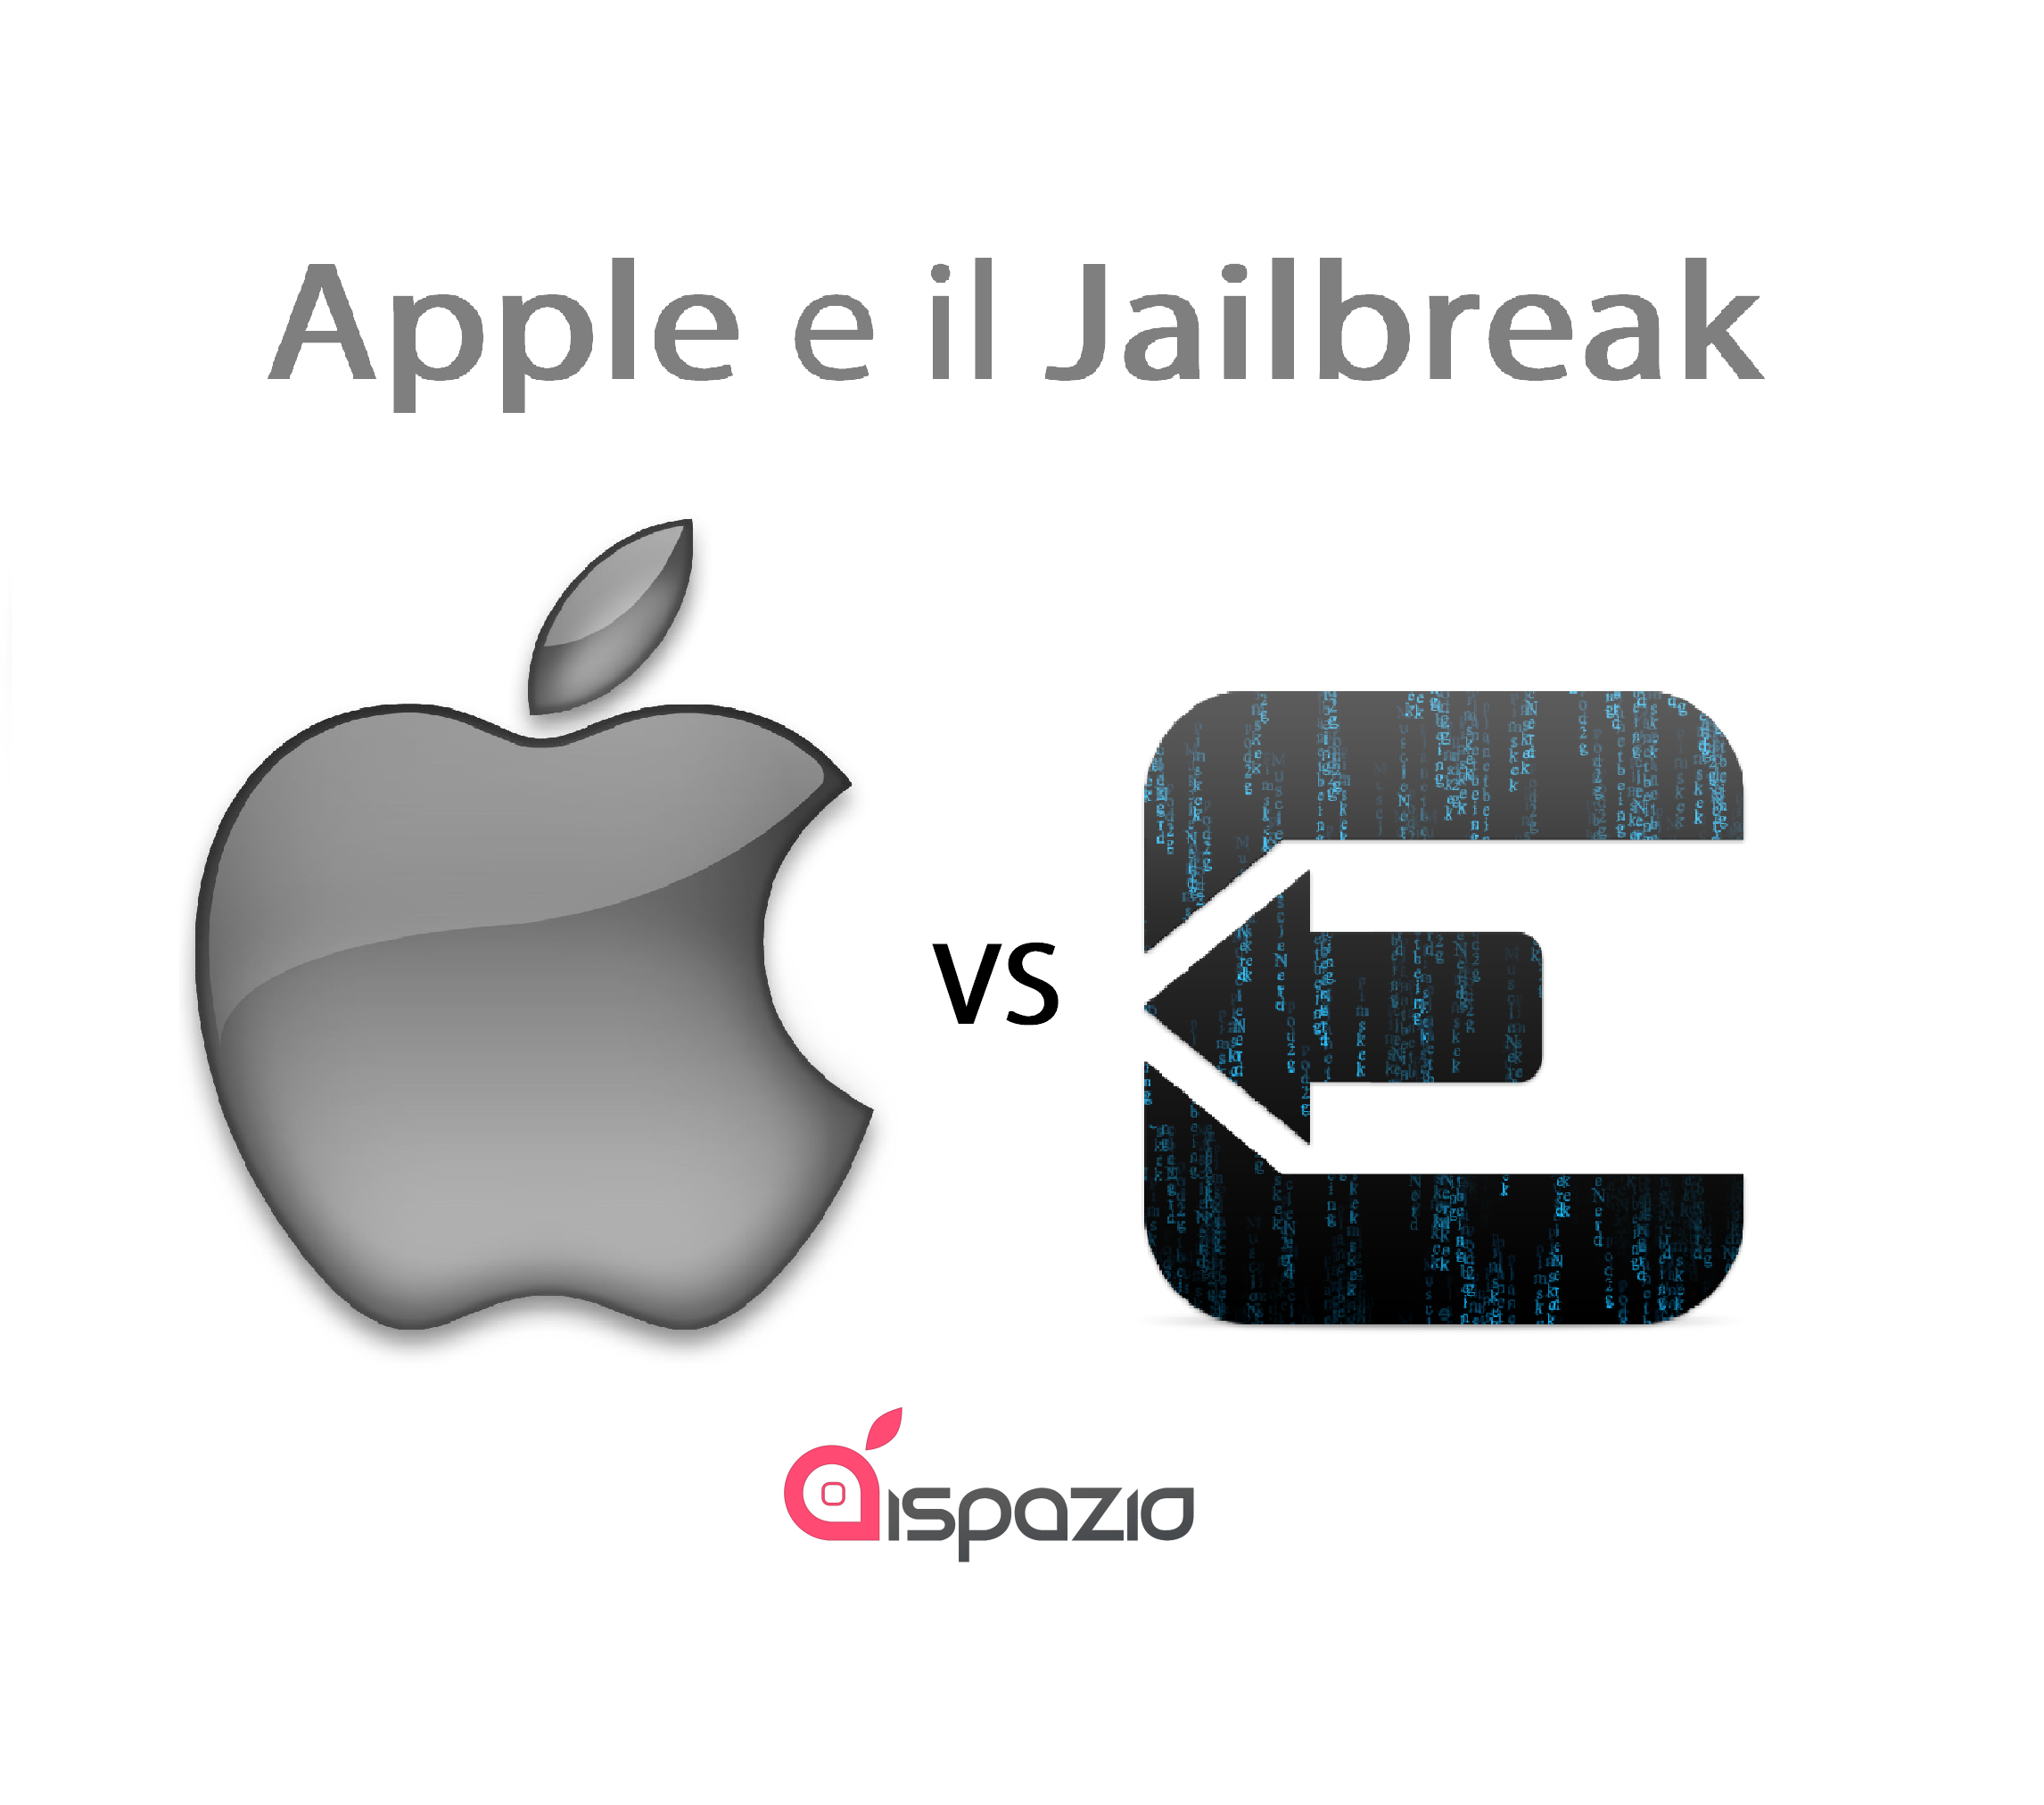 iOS 6.1.3 segnerà la fine per il Jailbreak Untethered di Evasi0n